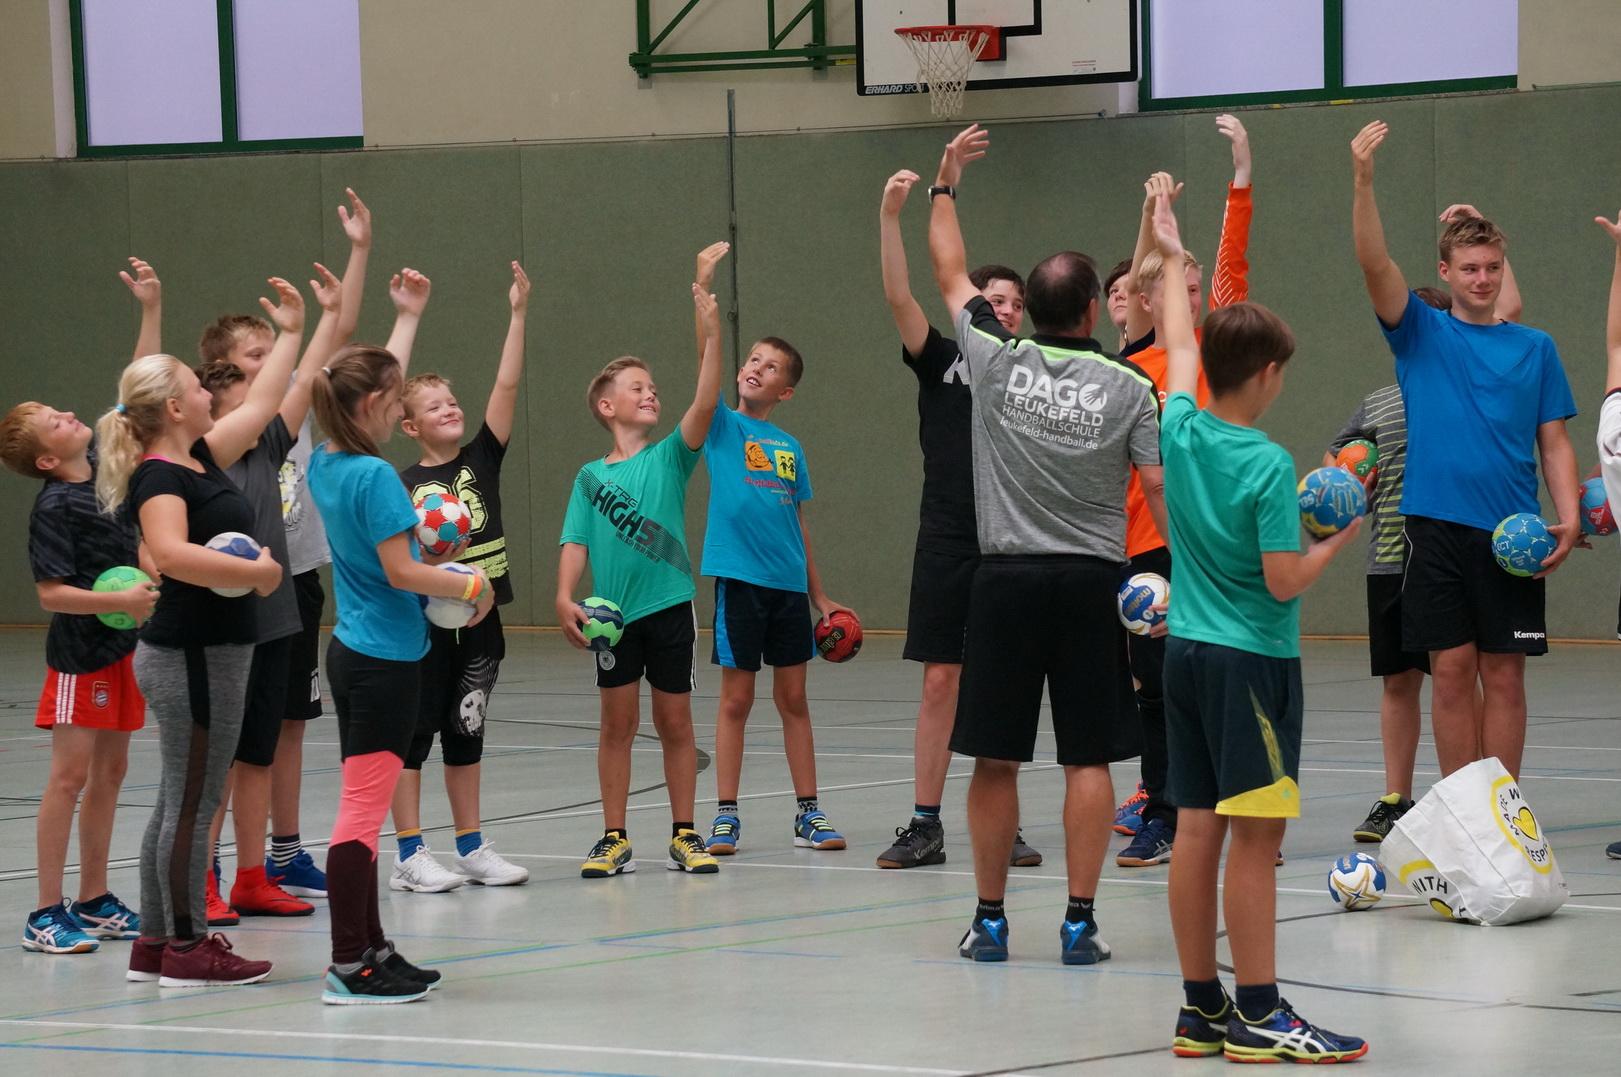 201808_Handballcamp_SDH_MG_069w